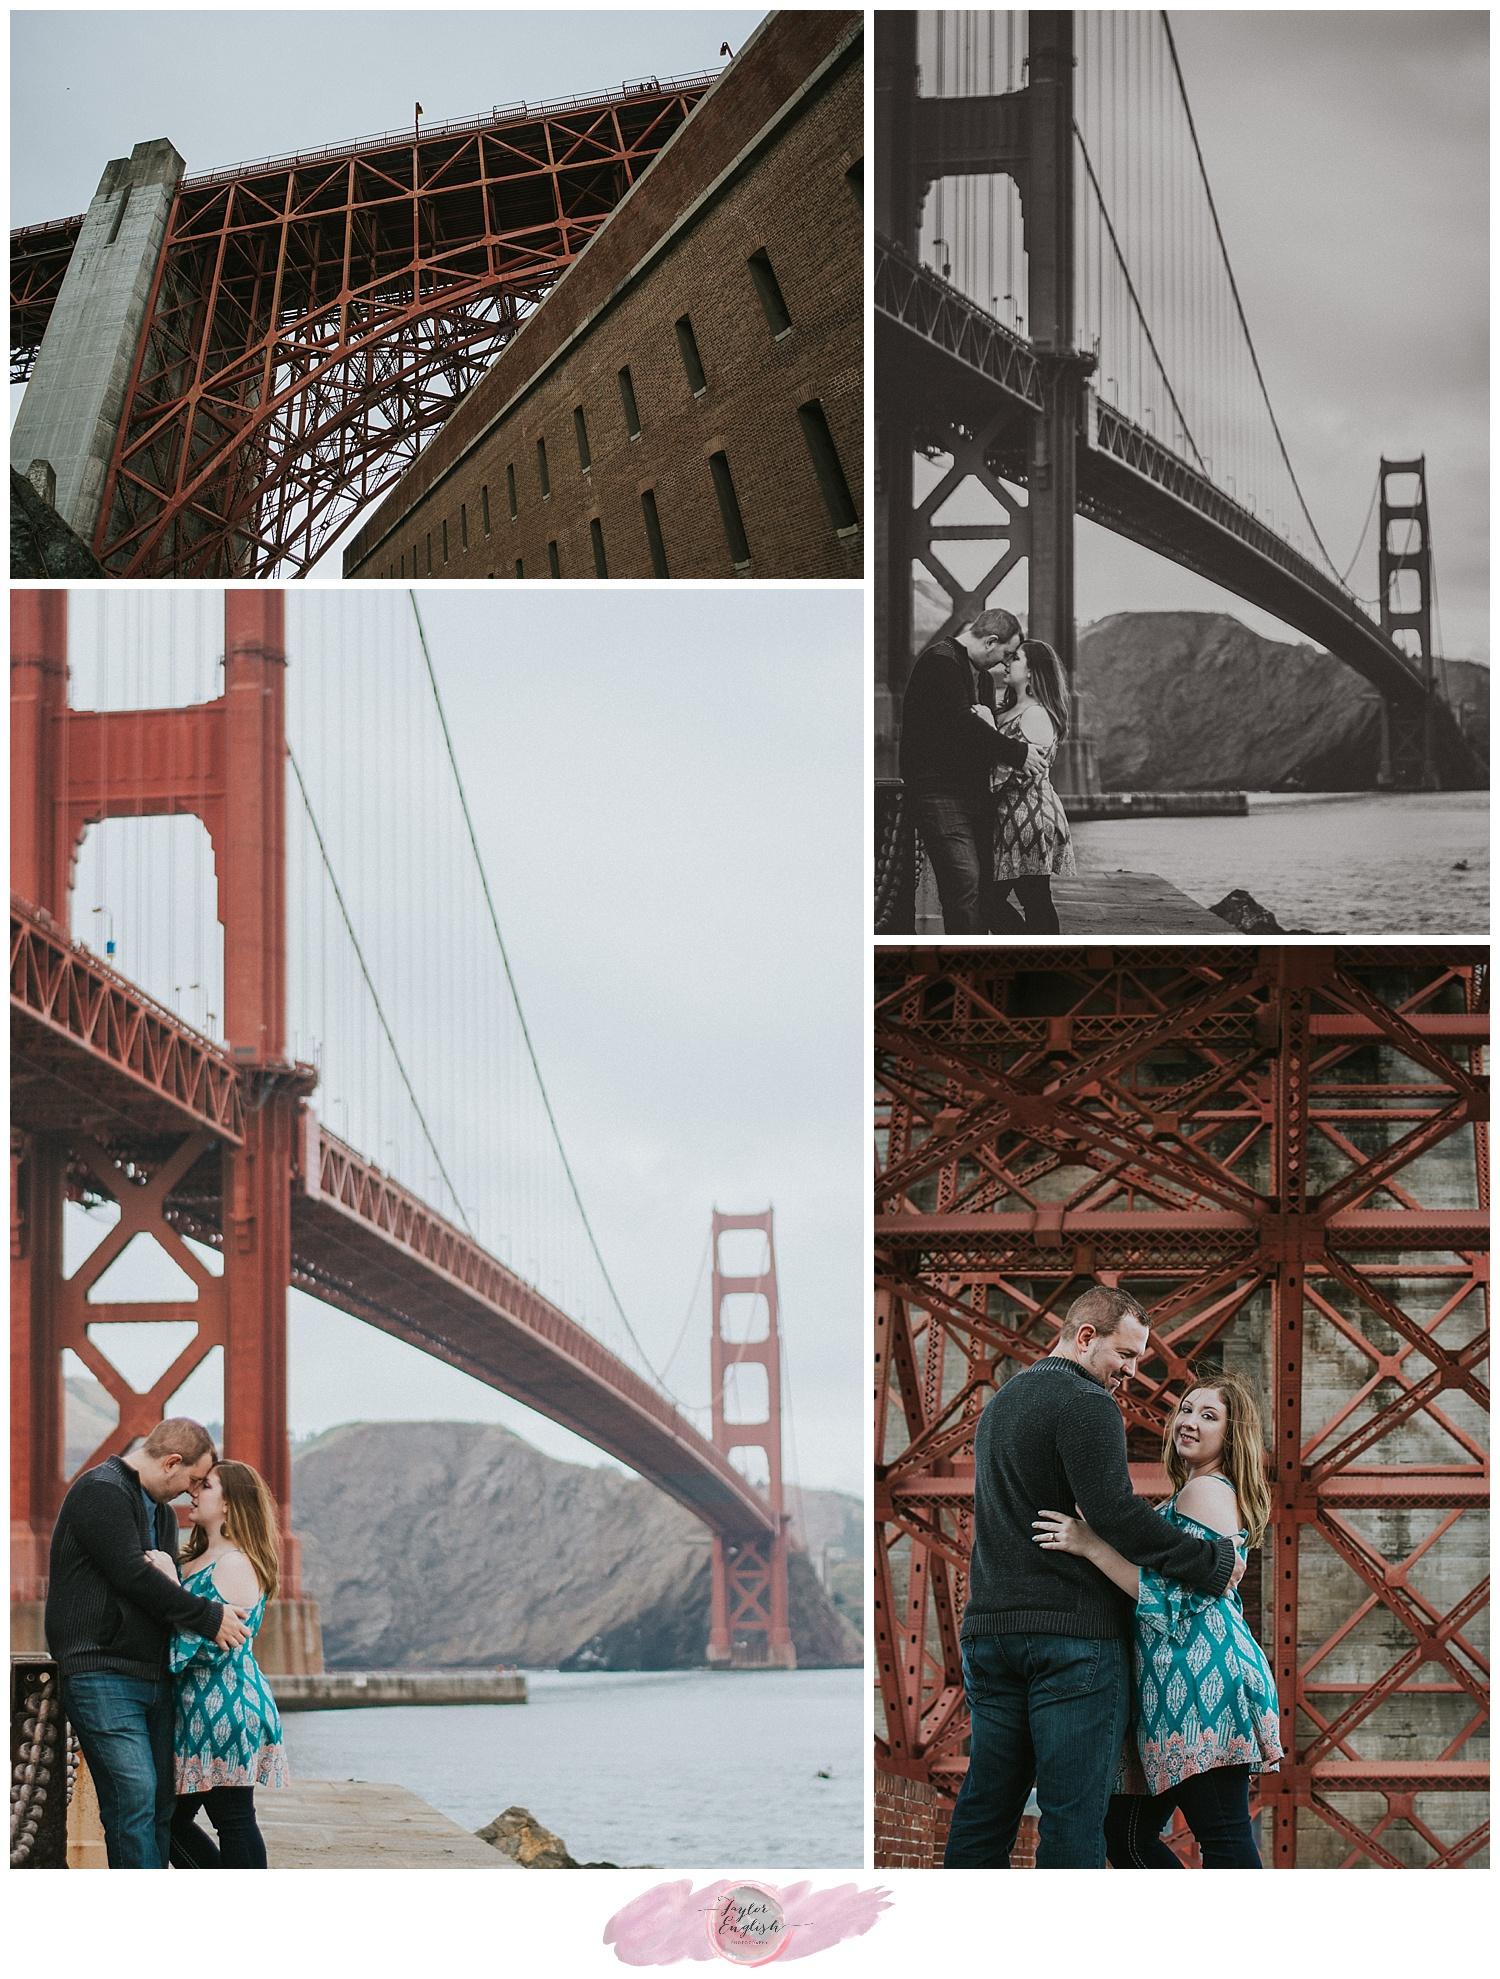 The famous San Francisco fog makes everything seem so romantic.